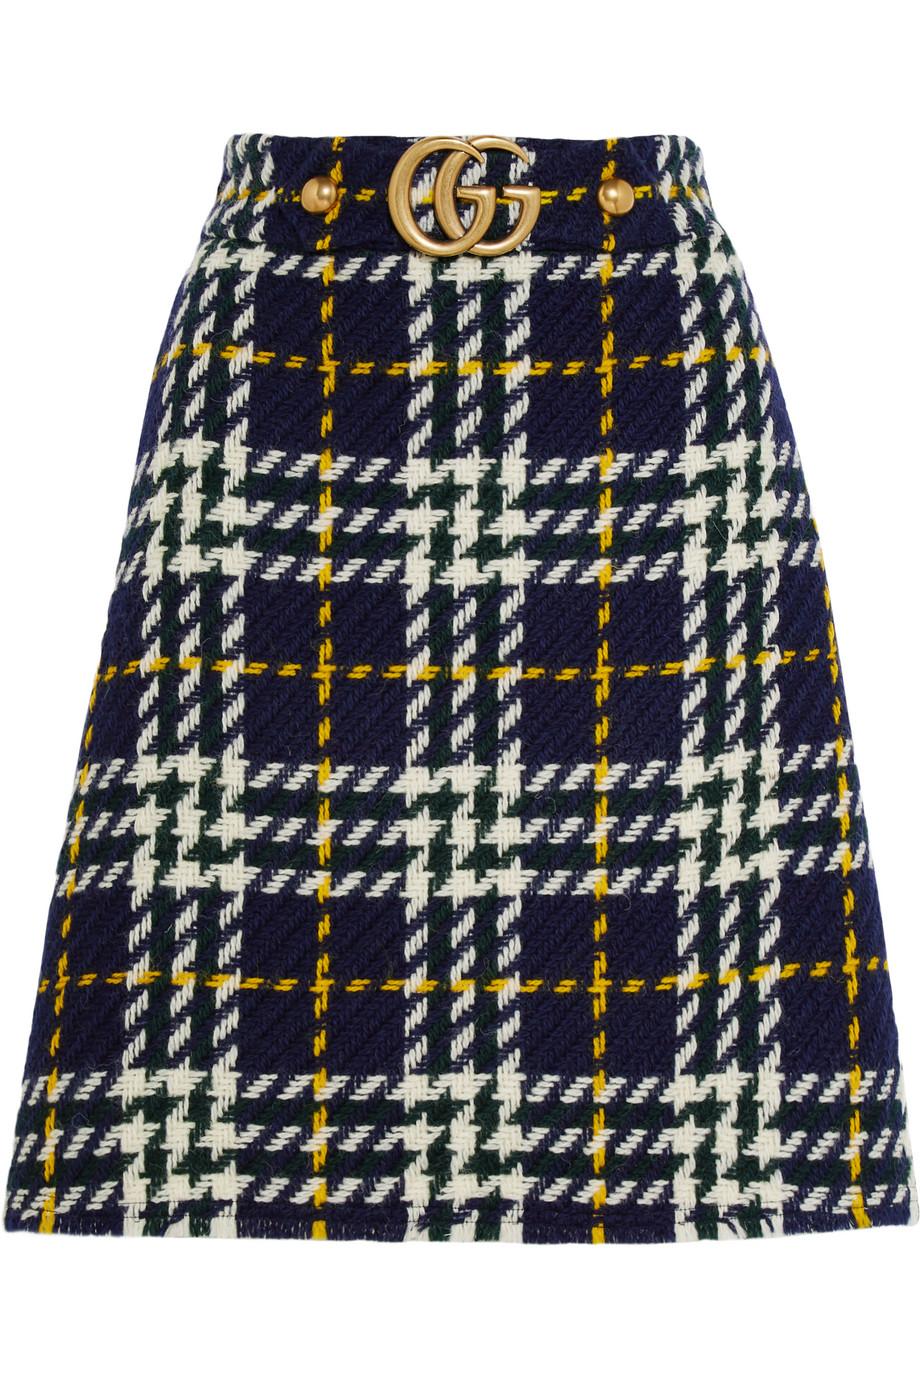 Gucci Plaid Wool Skirt, Emerald/Blue, Women's, Size: 38